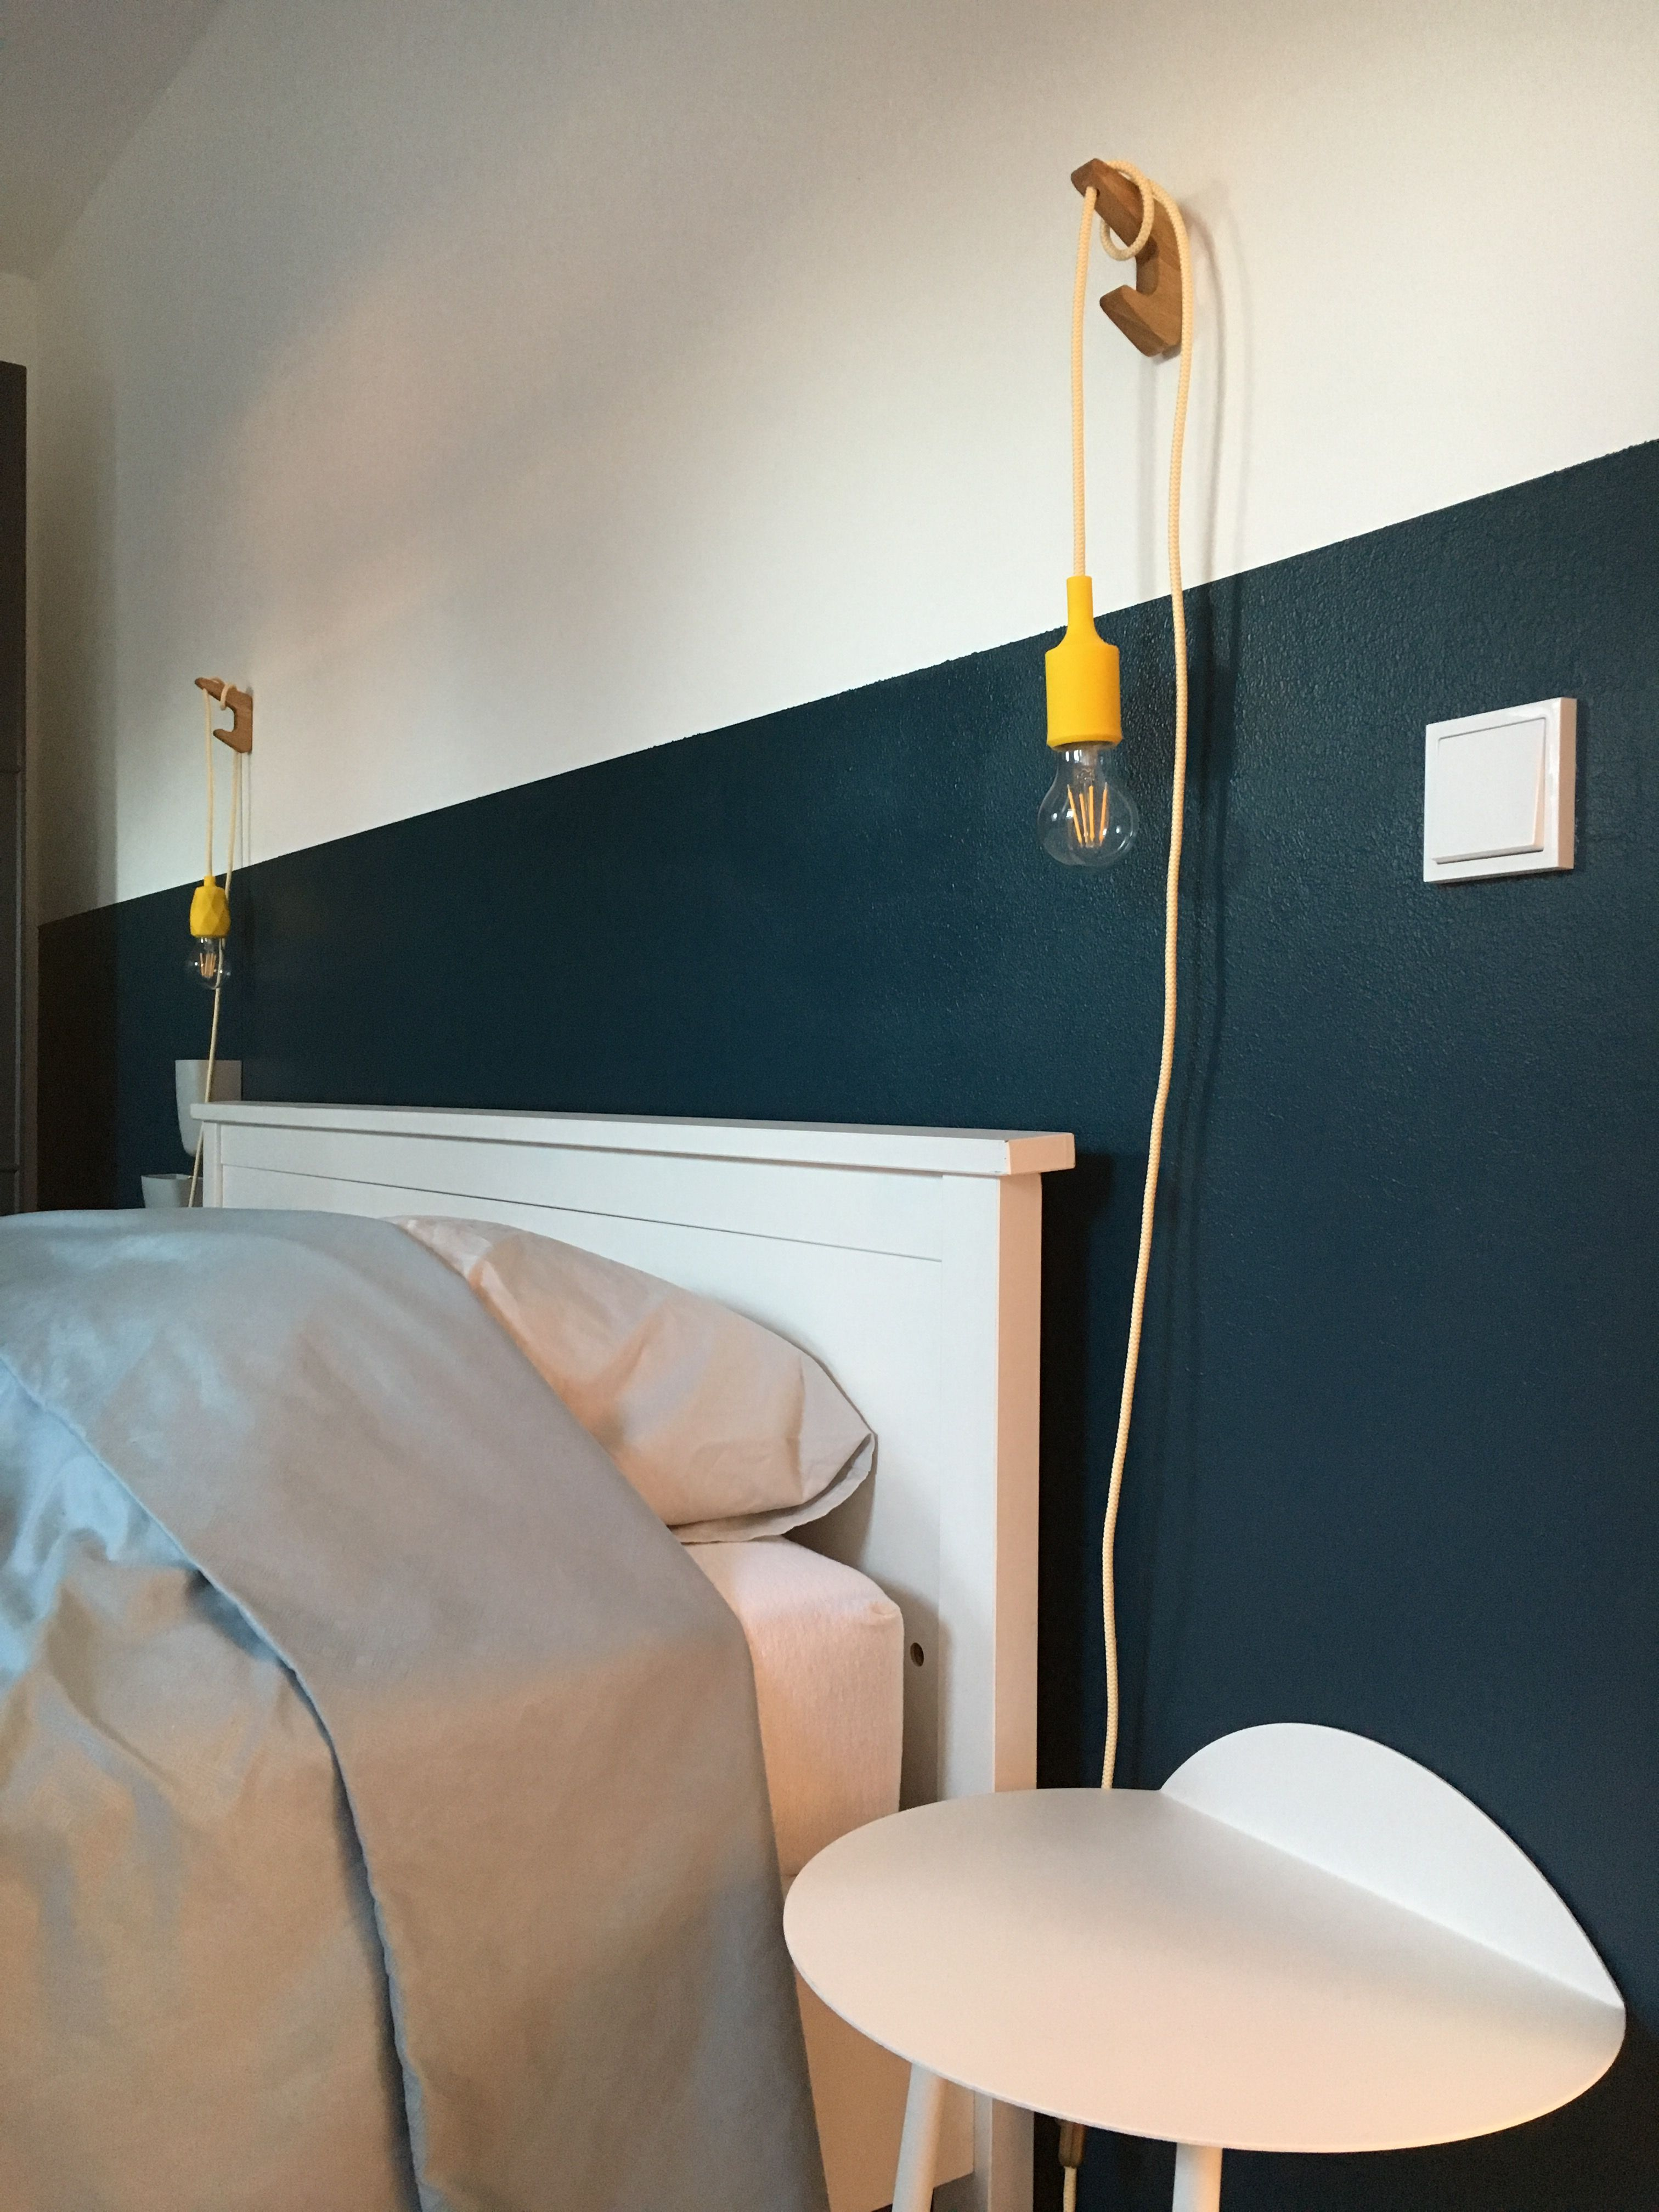 Nachtlampje met snoer van Stoersnoer en wandhaakje via Etsy